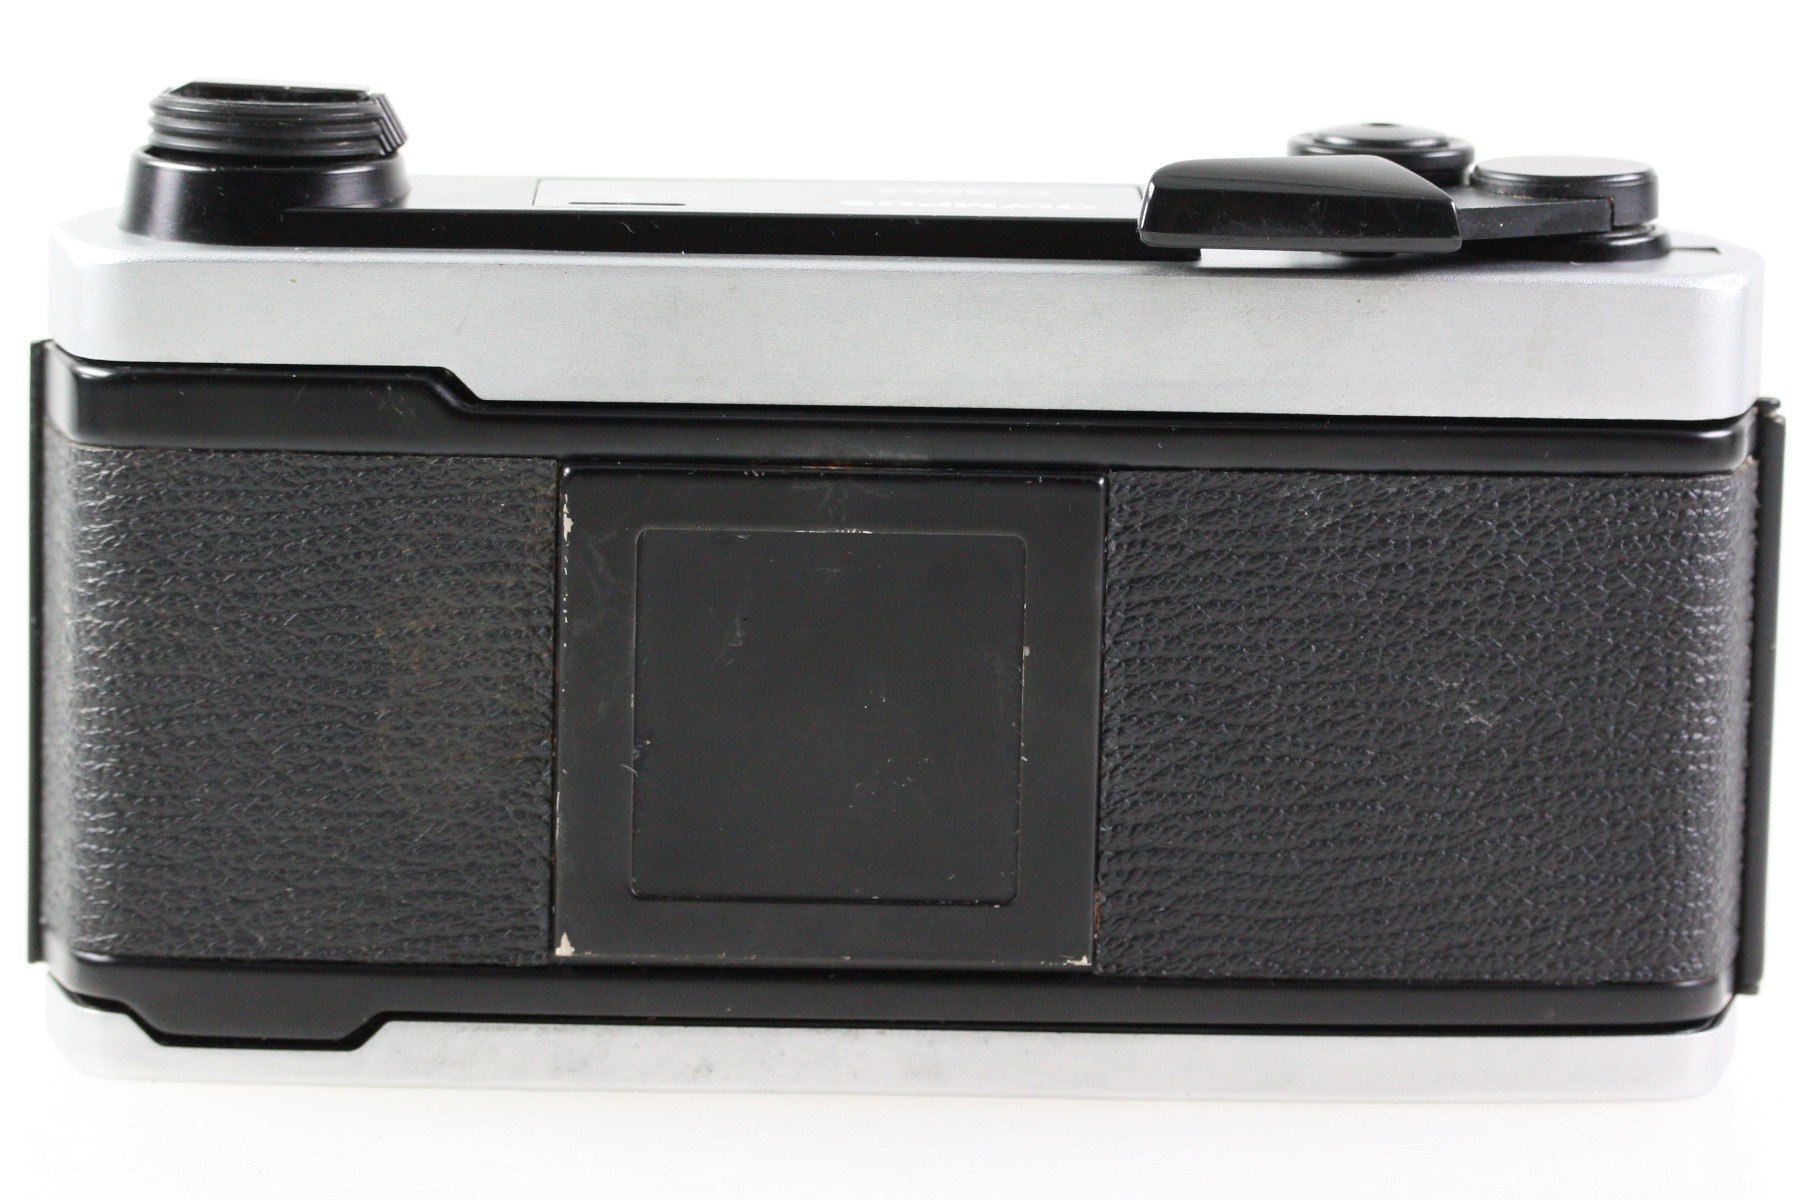 Olympus c 35da 2 mikroskop kamera body microscope camera